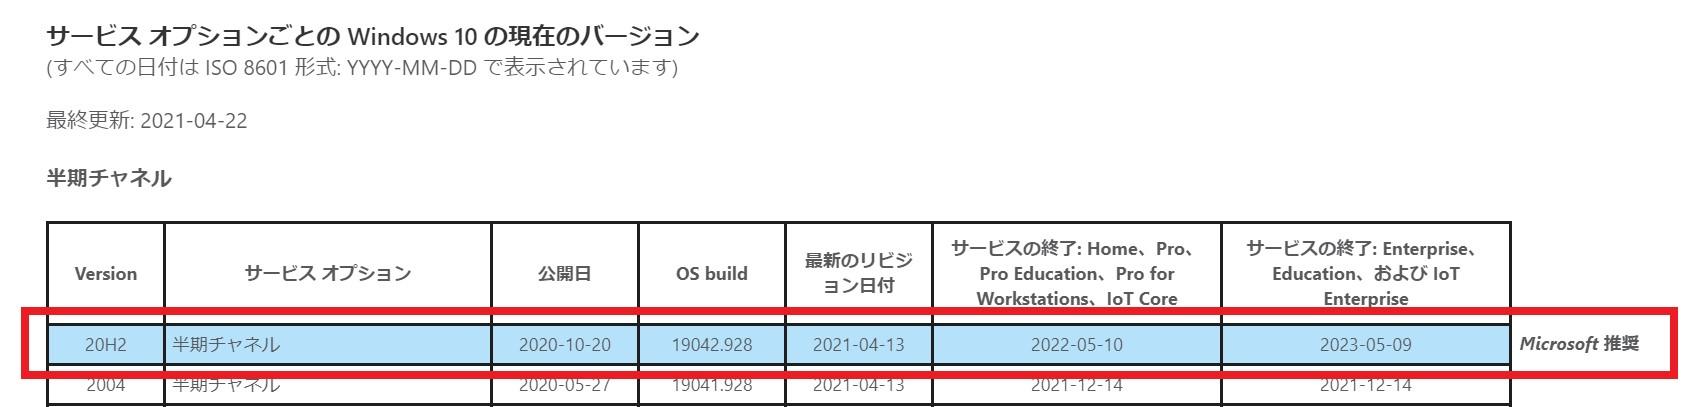 Windows10 20H2 リリース日